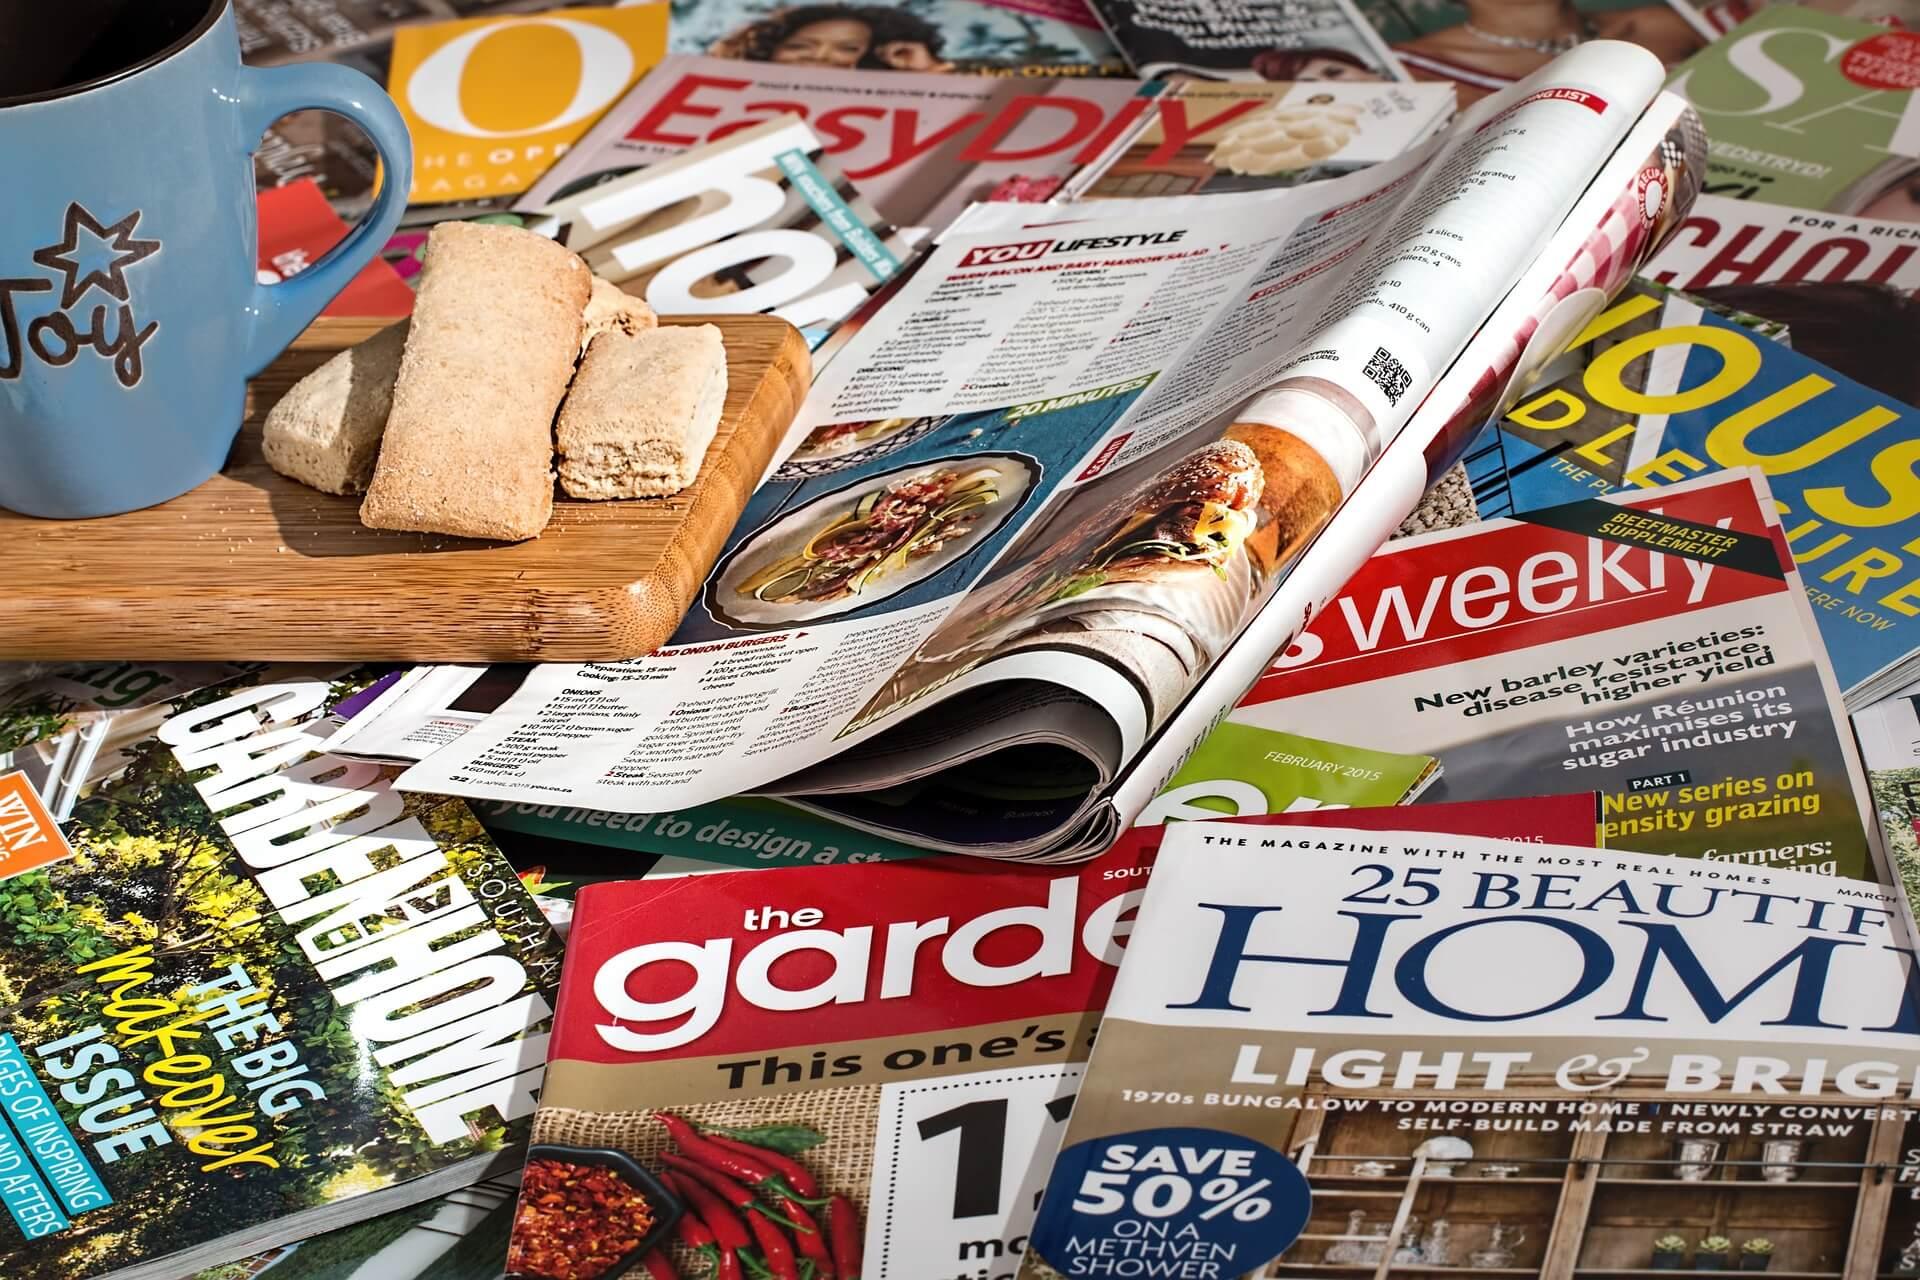 advertisement ads magazine online awareness sale